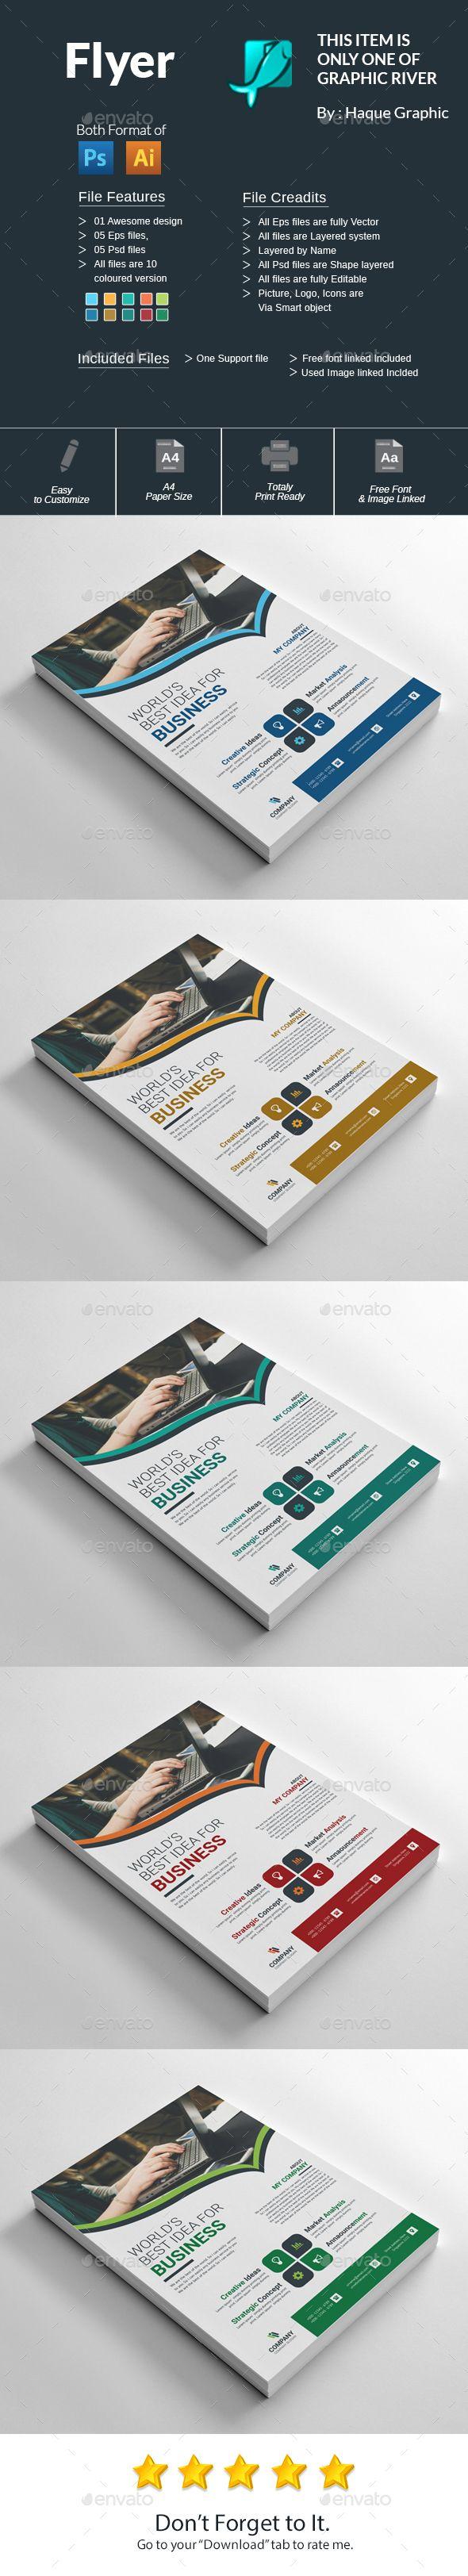 Flyer Template PSD, Vector EPS, AI Illustrator